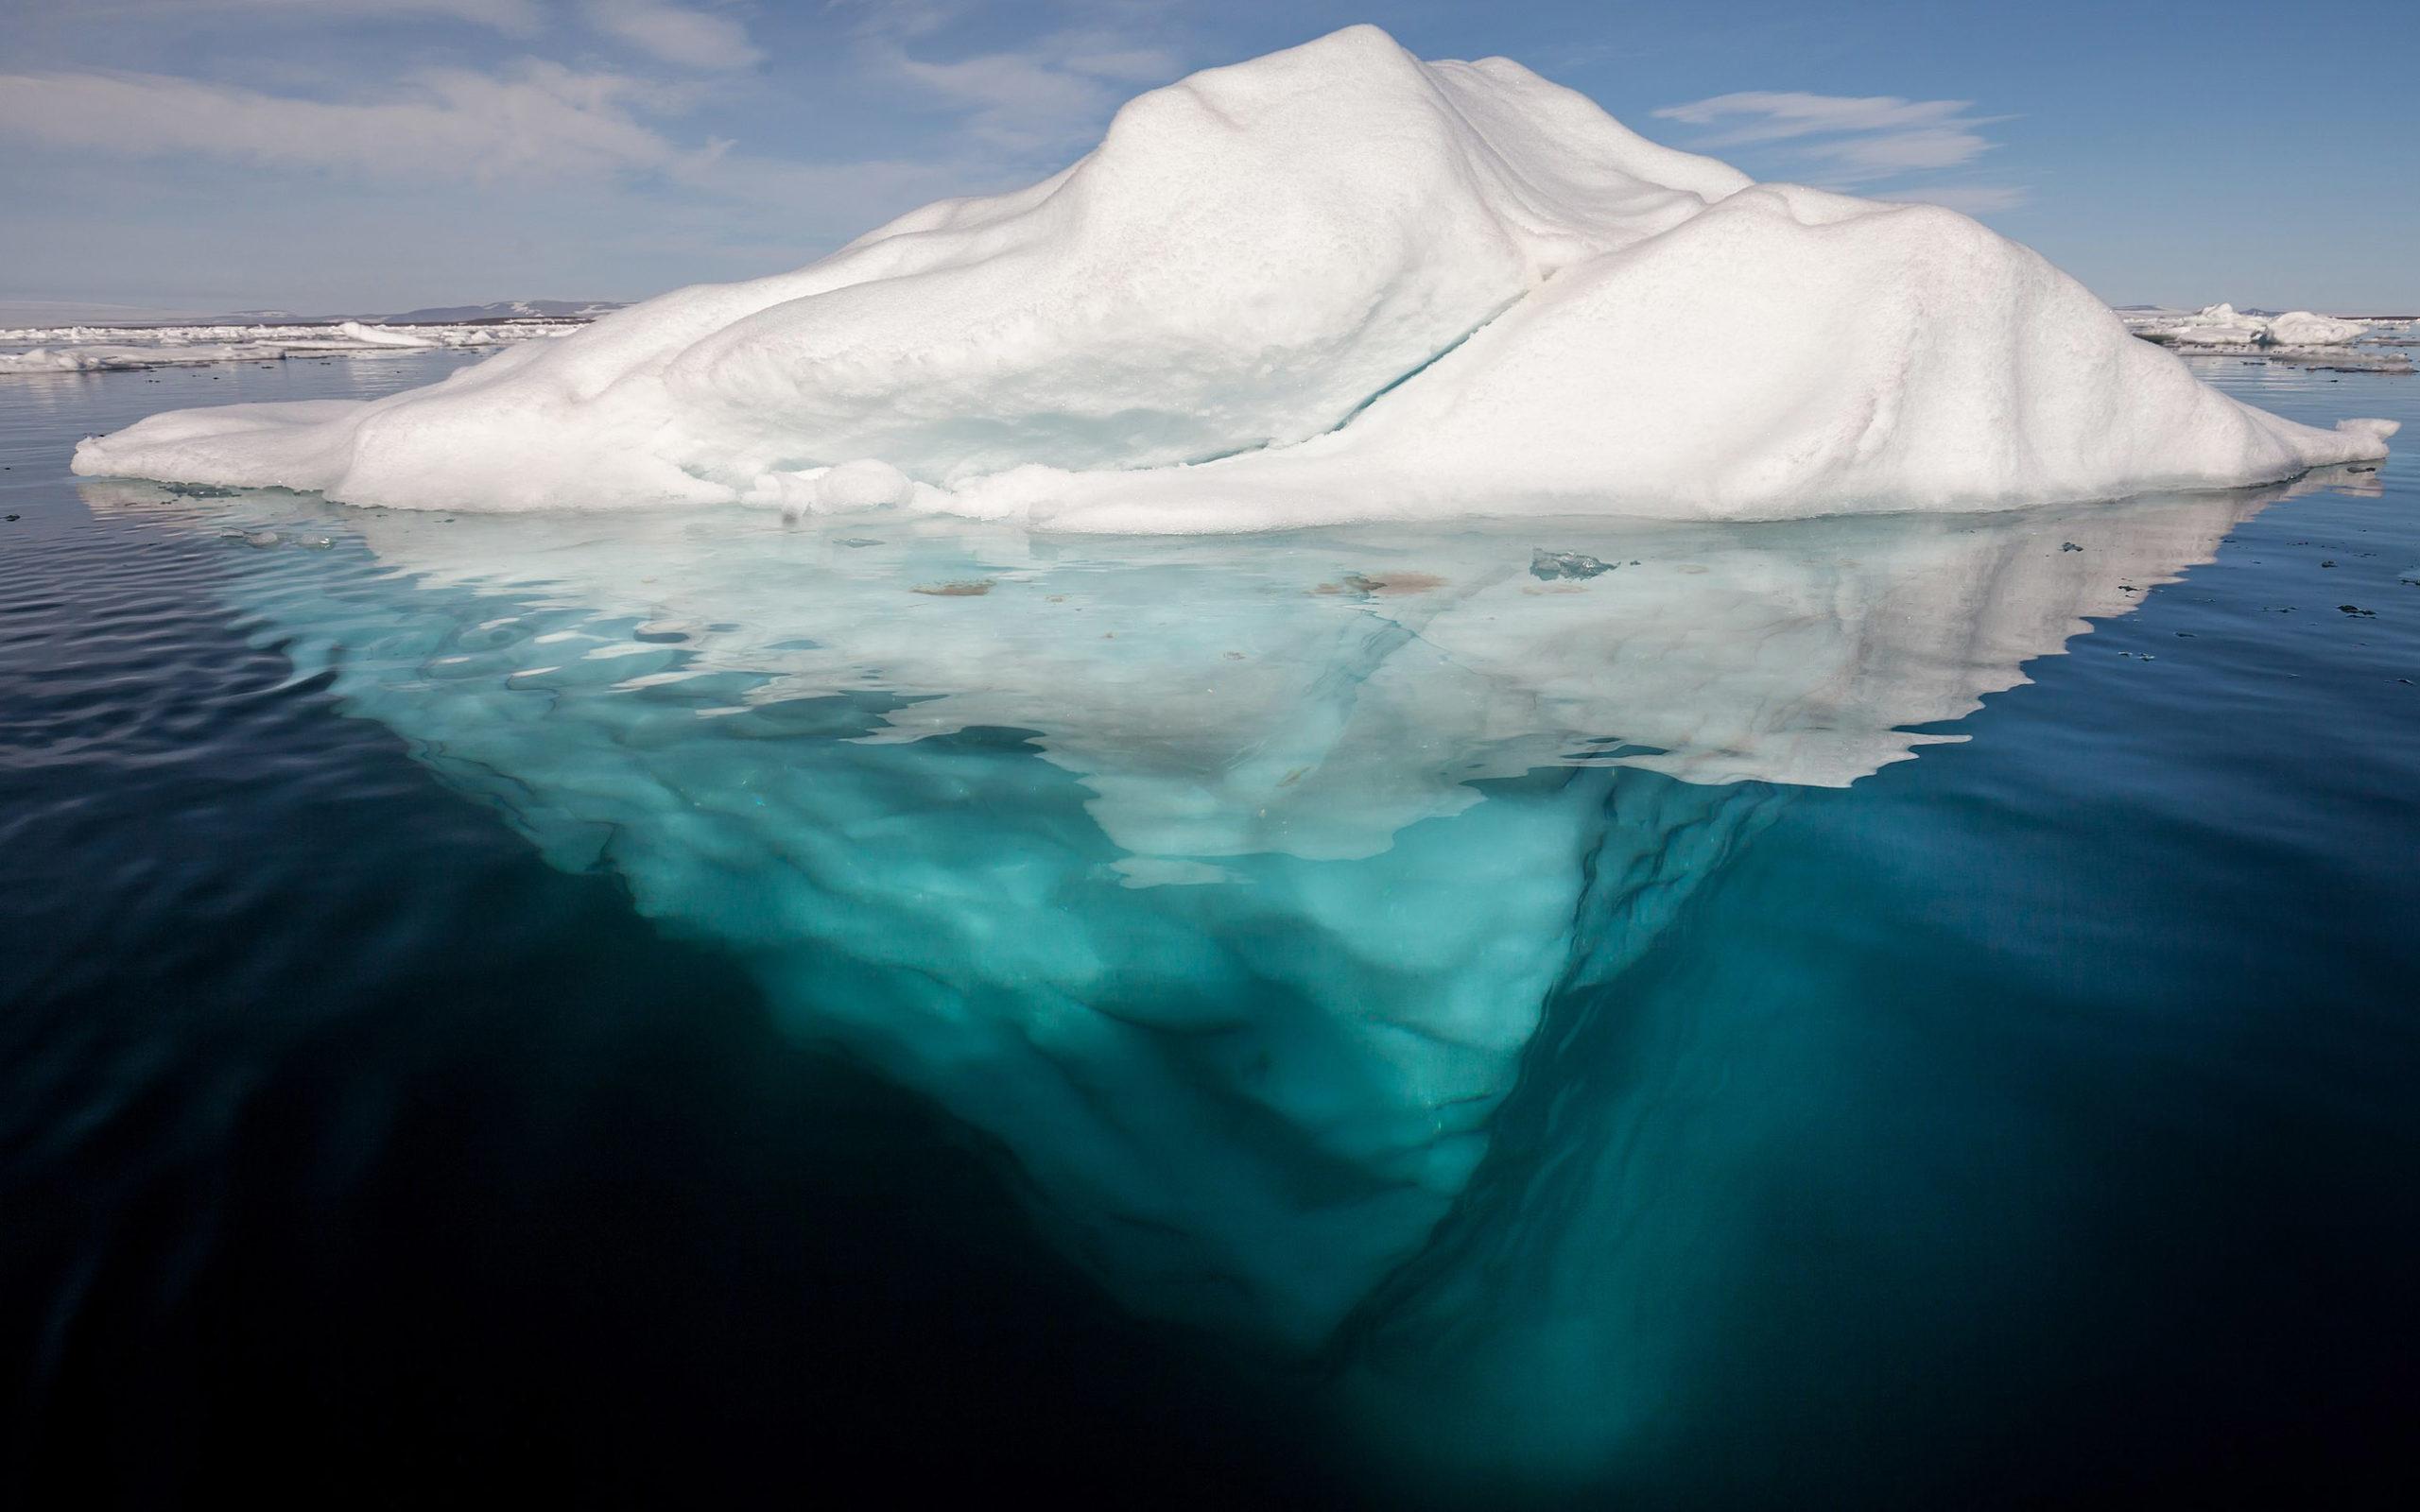 Nord-West-Passage (Baffininsel, Ellesmere-Insel, Beechey-Insel, Devon-Insel, Victoria-Insel)